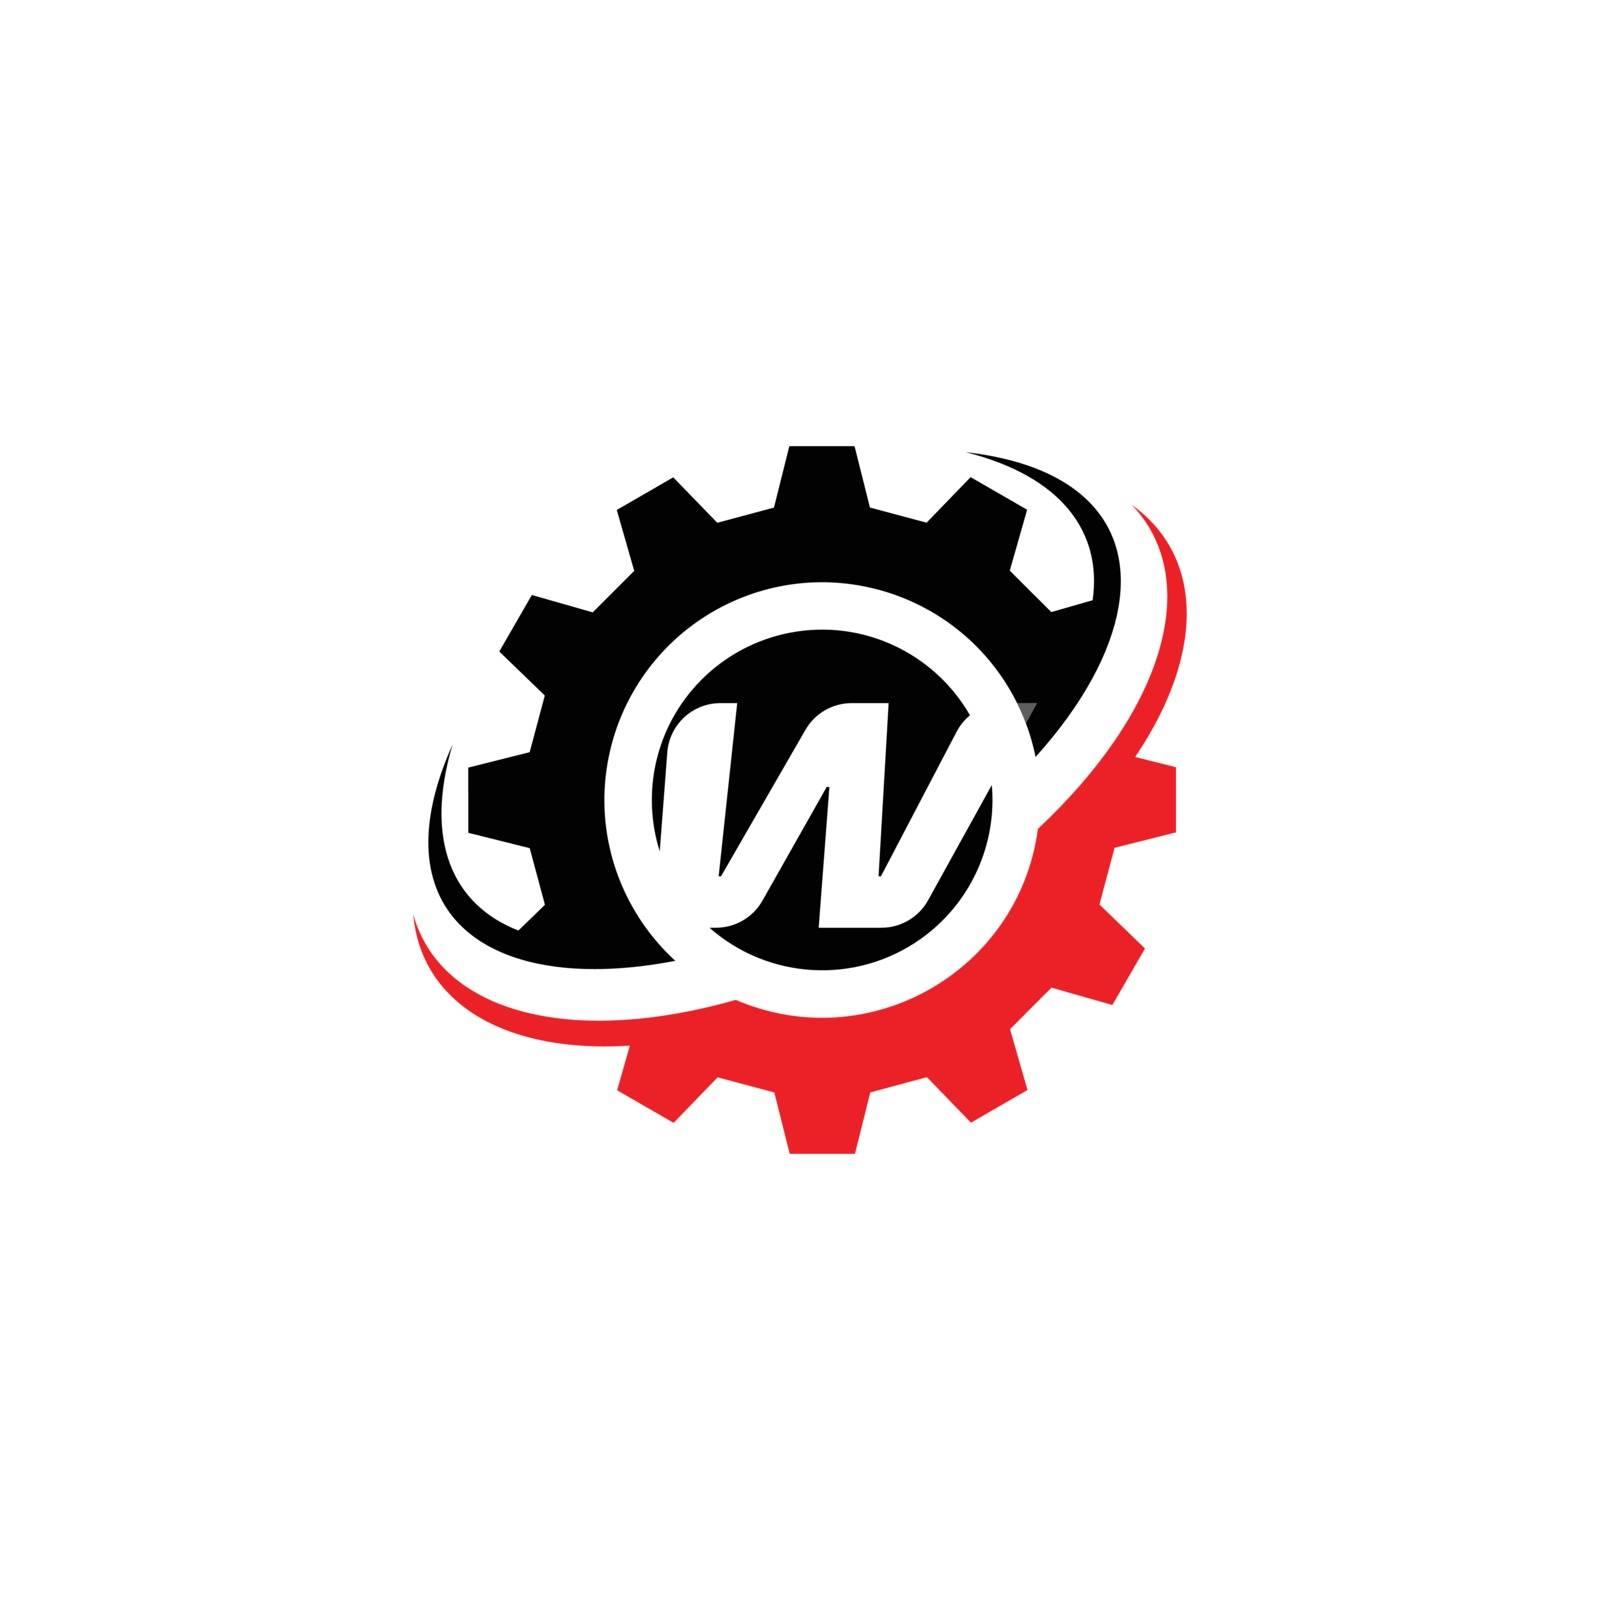 Letter W Gear Logo Design Template